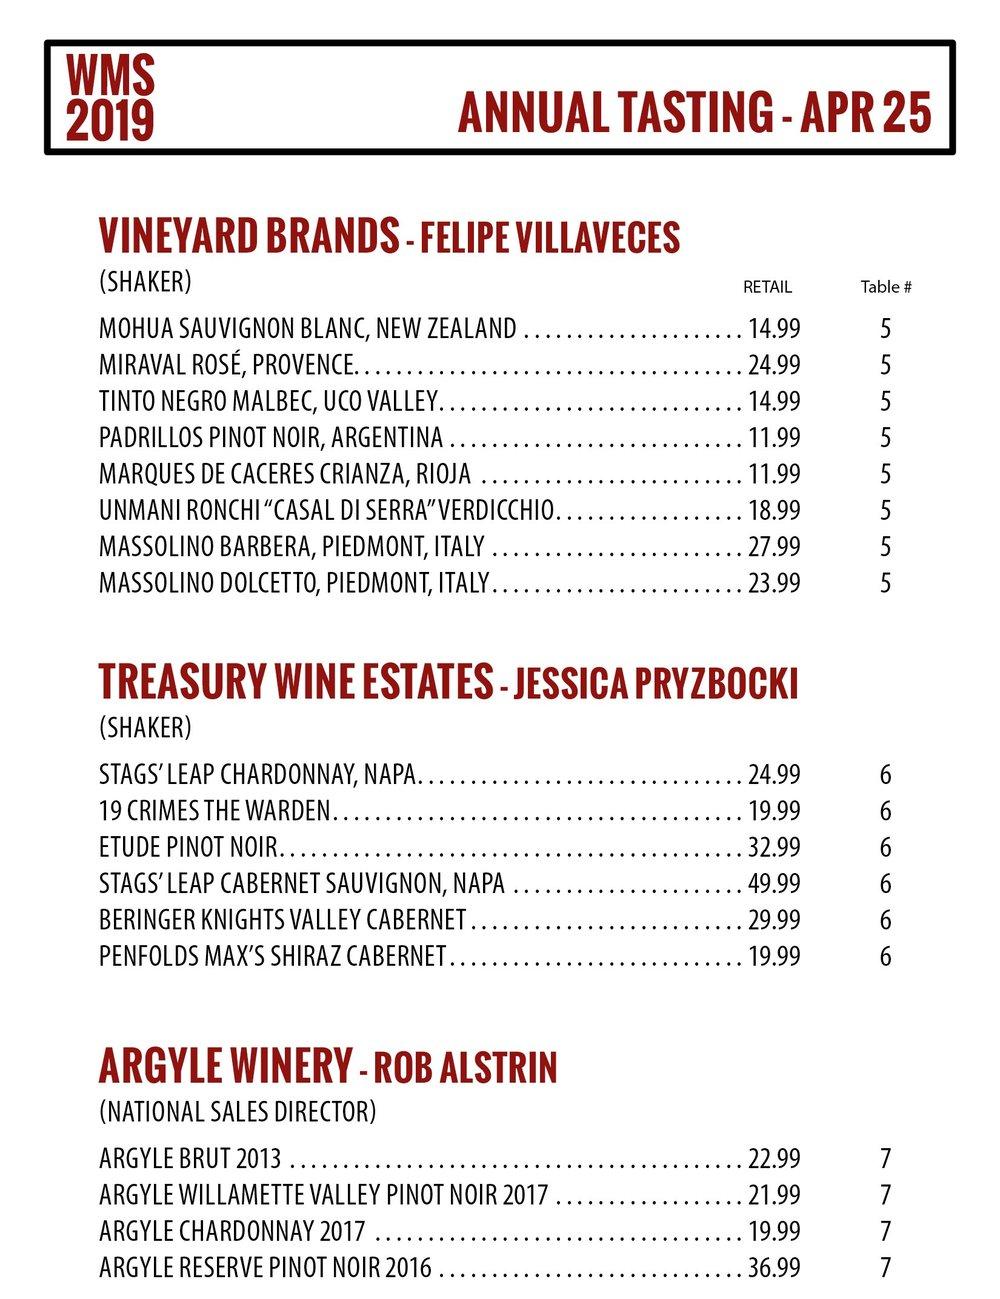 Winemakers+and+Shakers_Tasting+Guide_20194.jpg